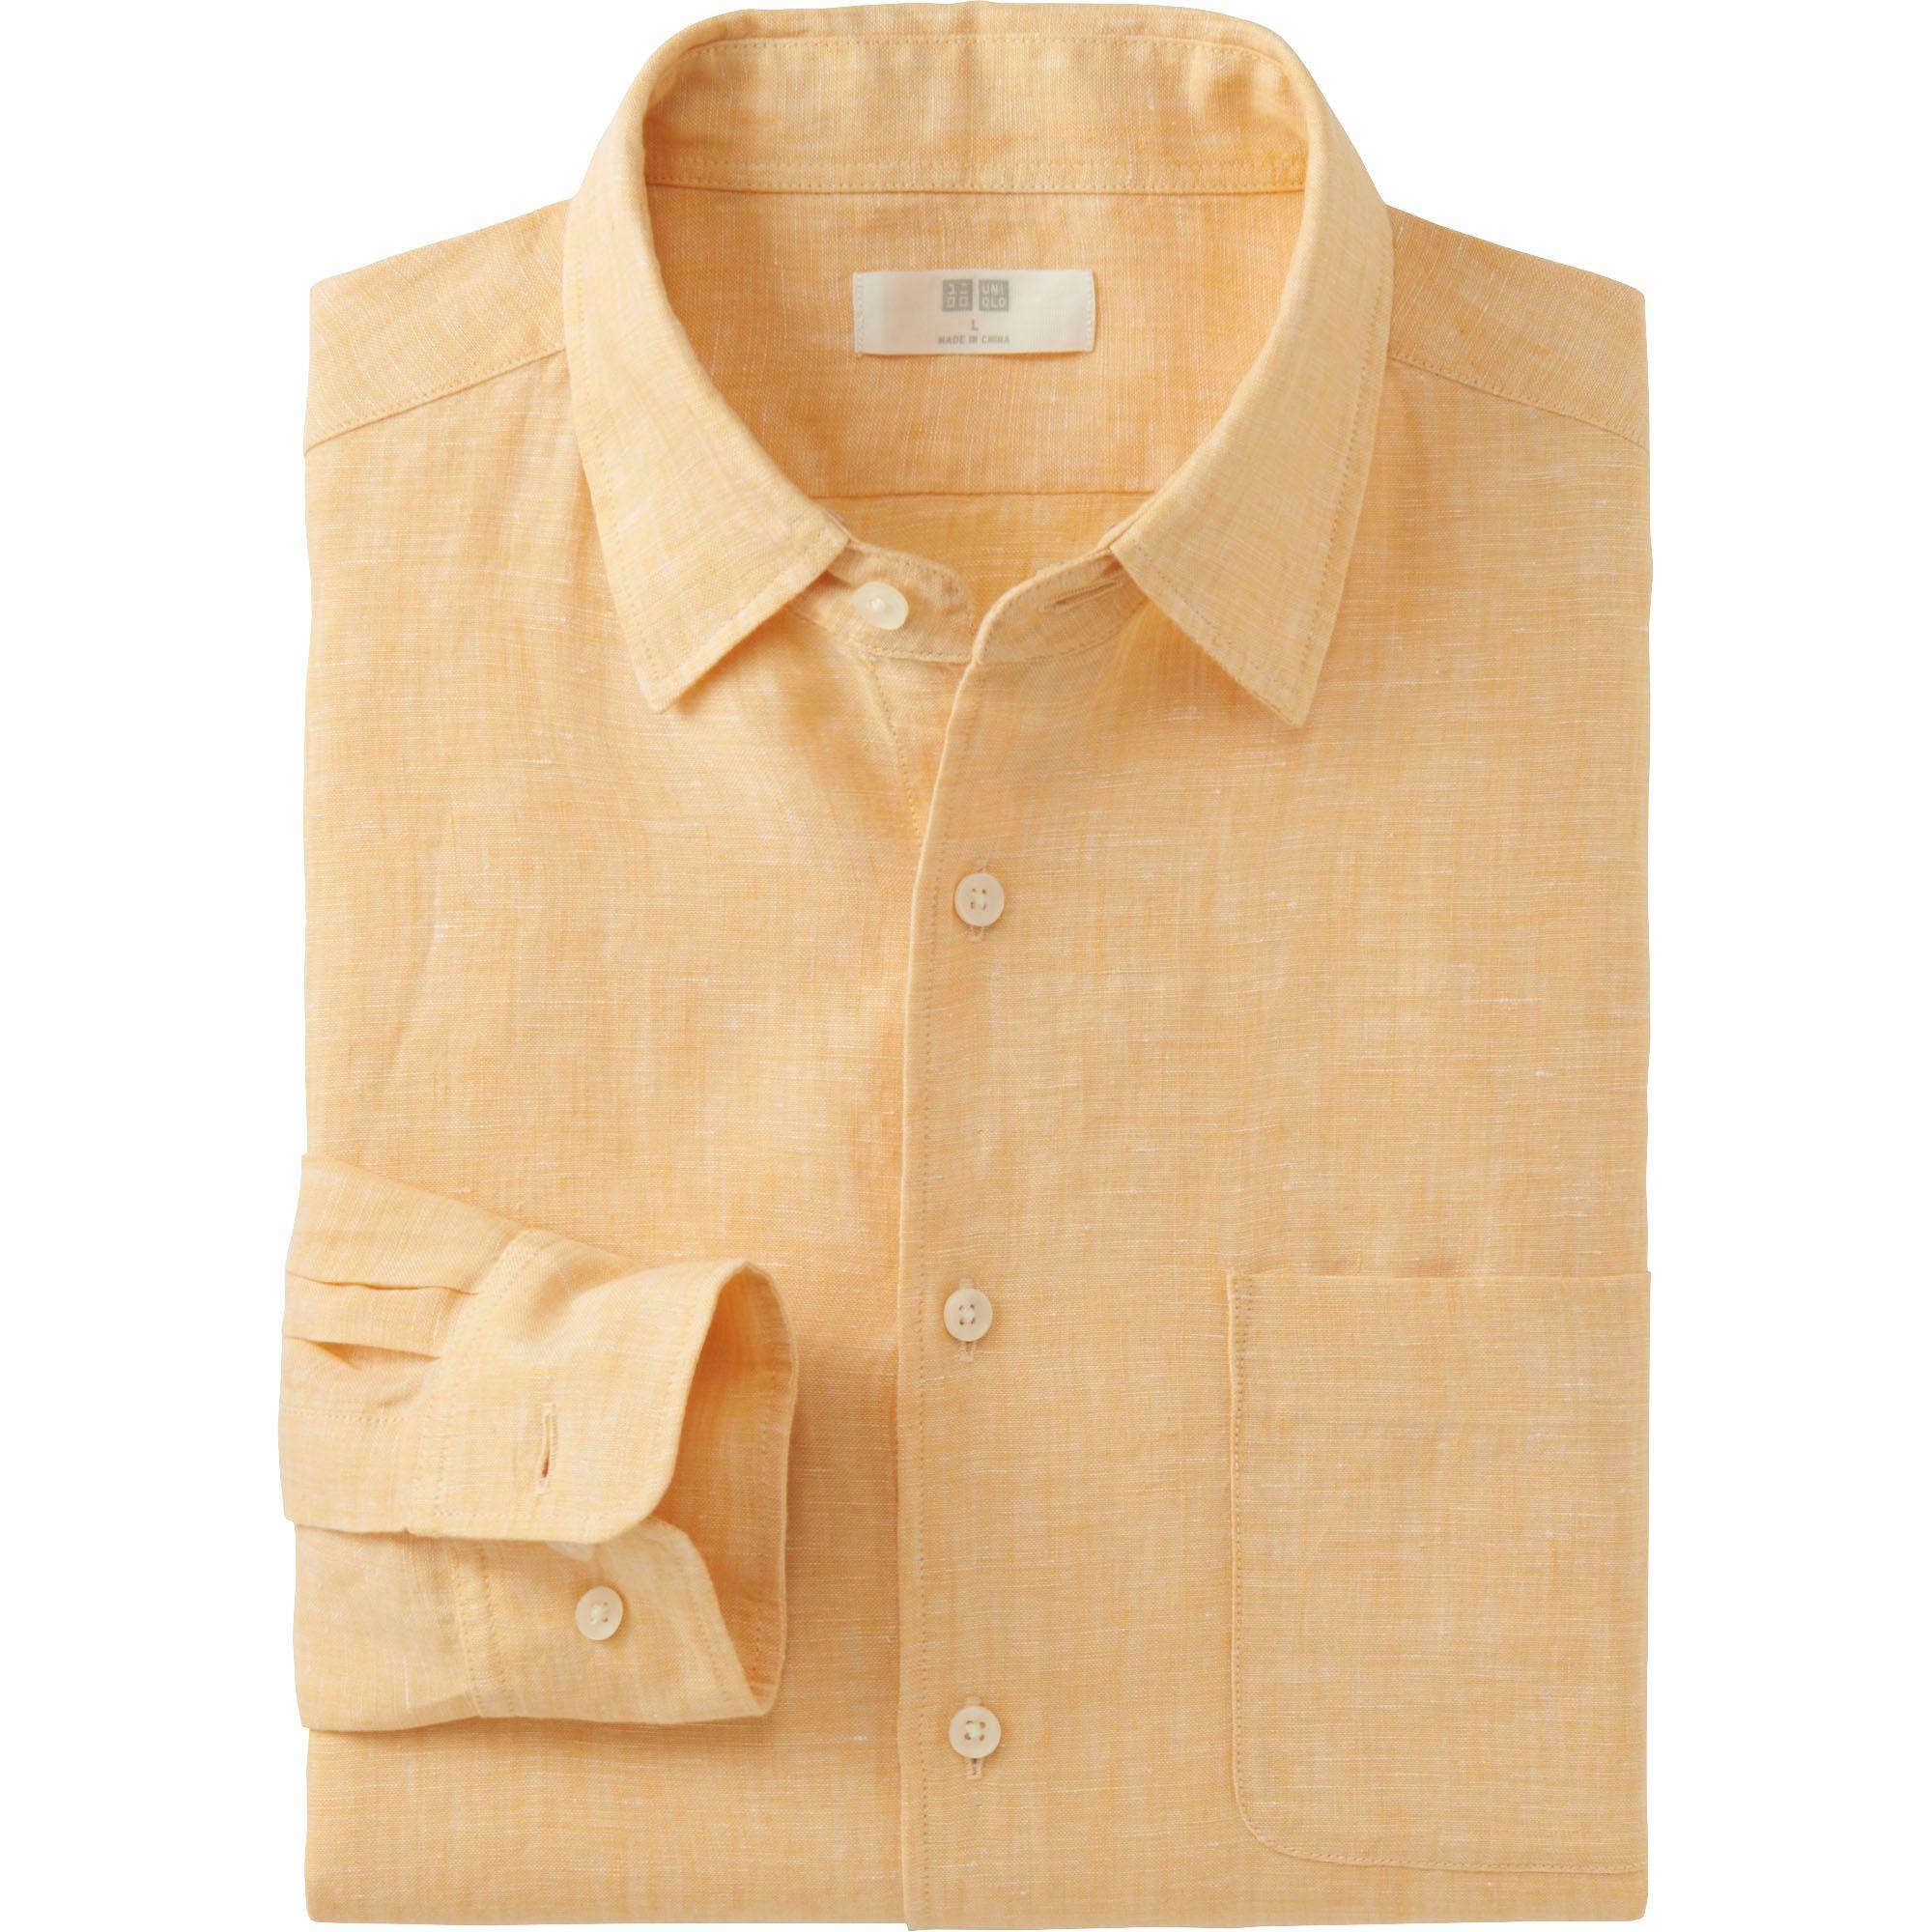 Uniqlo men premium linen long sleeve shirt in yellow for for Linen long sleeve shirt